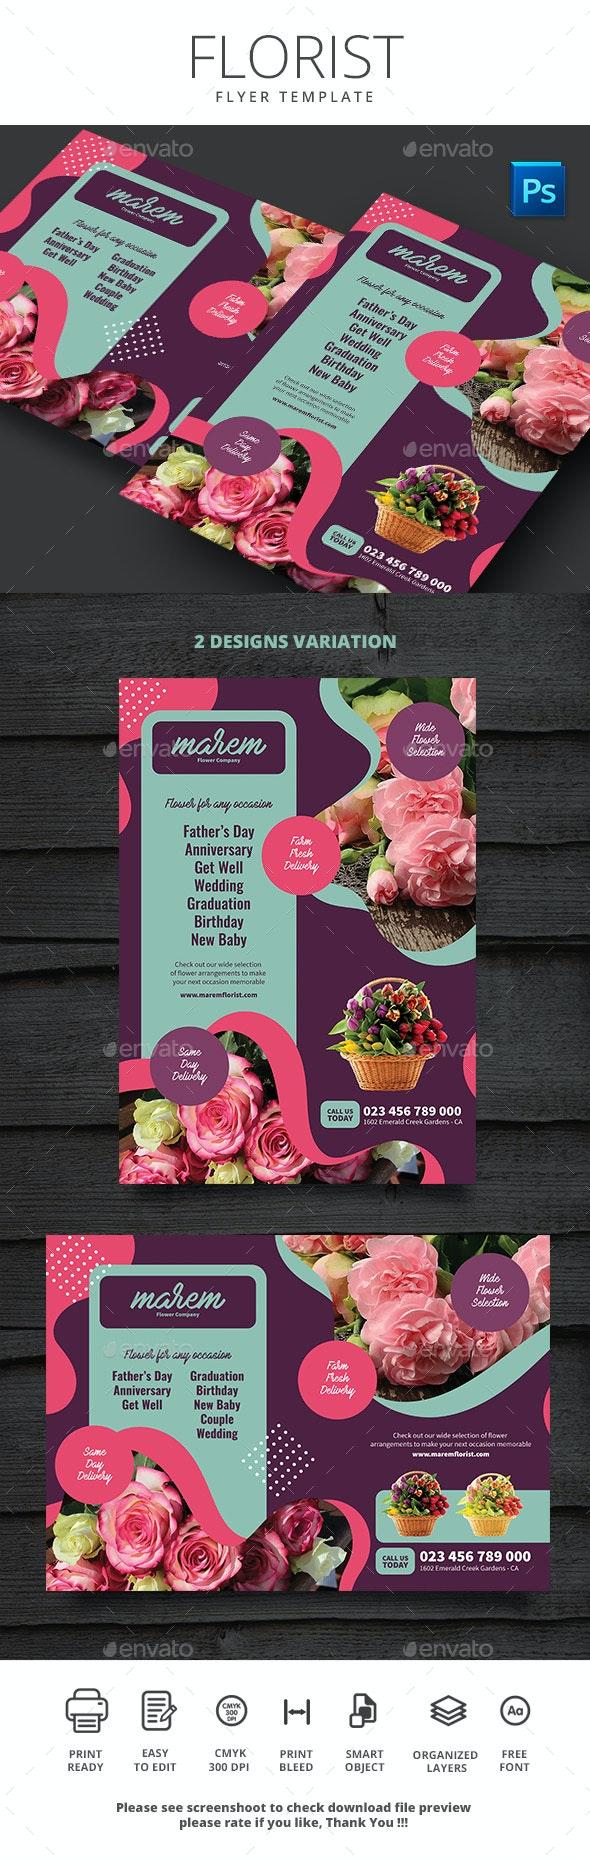 Florist Flyer Template - Print Templates